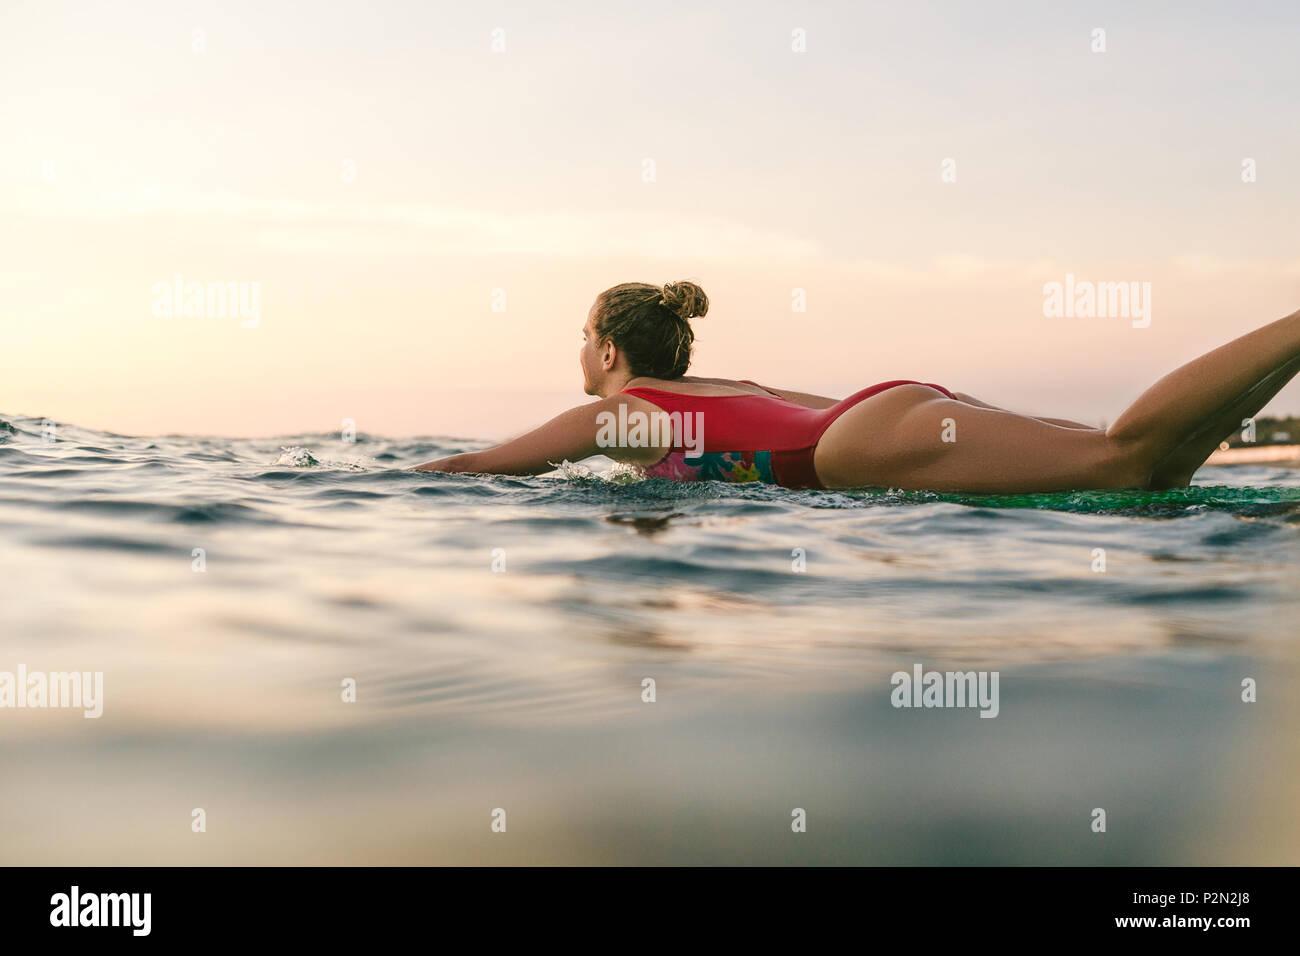 sportswoman in swimming suit surfing alone in ocean - Stock Image